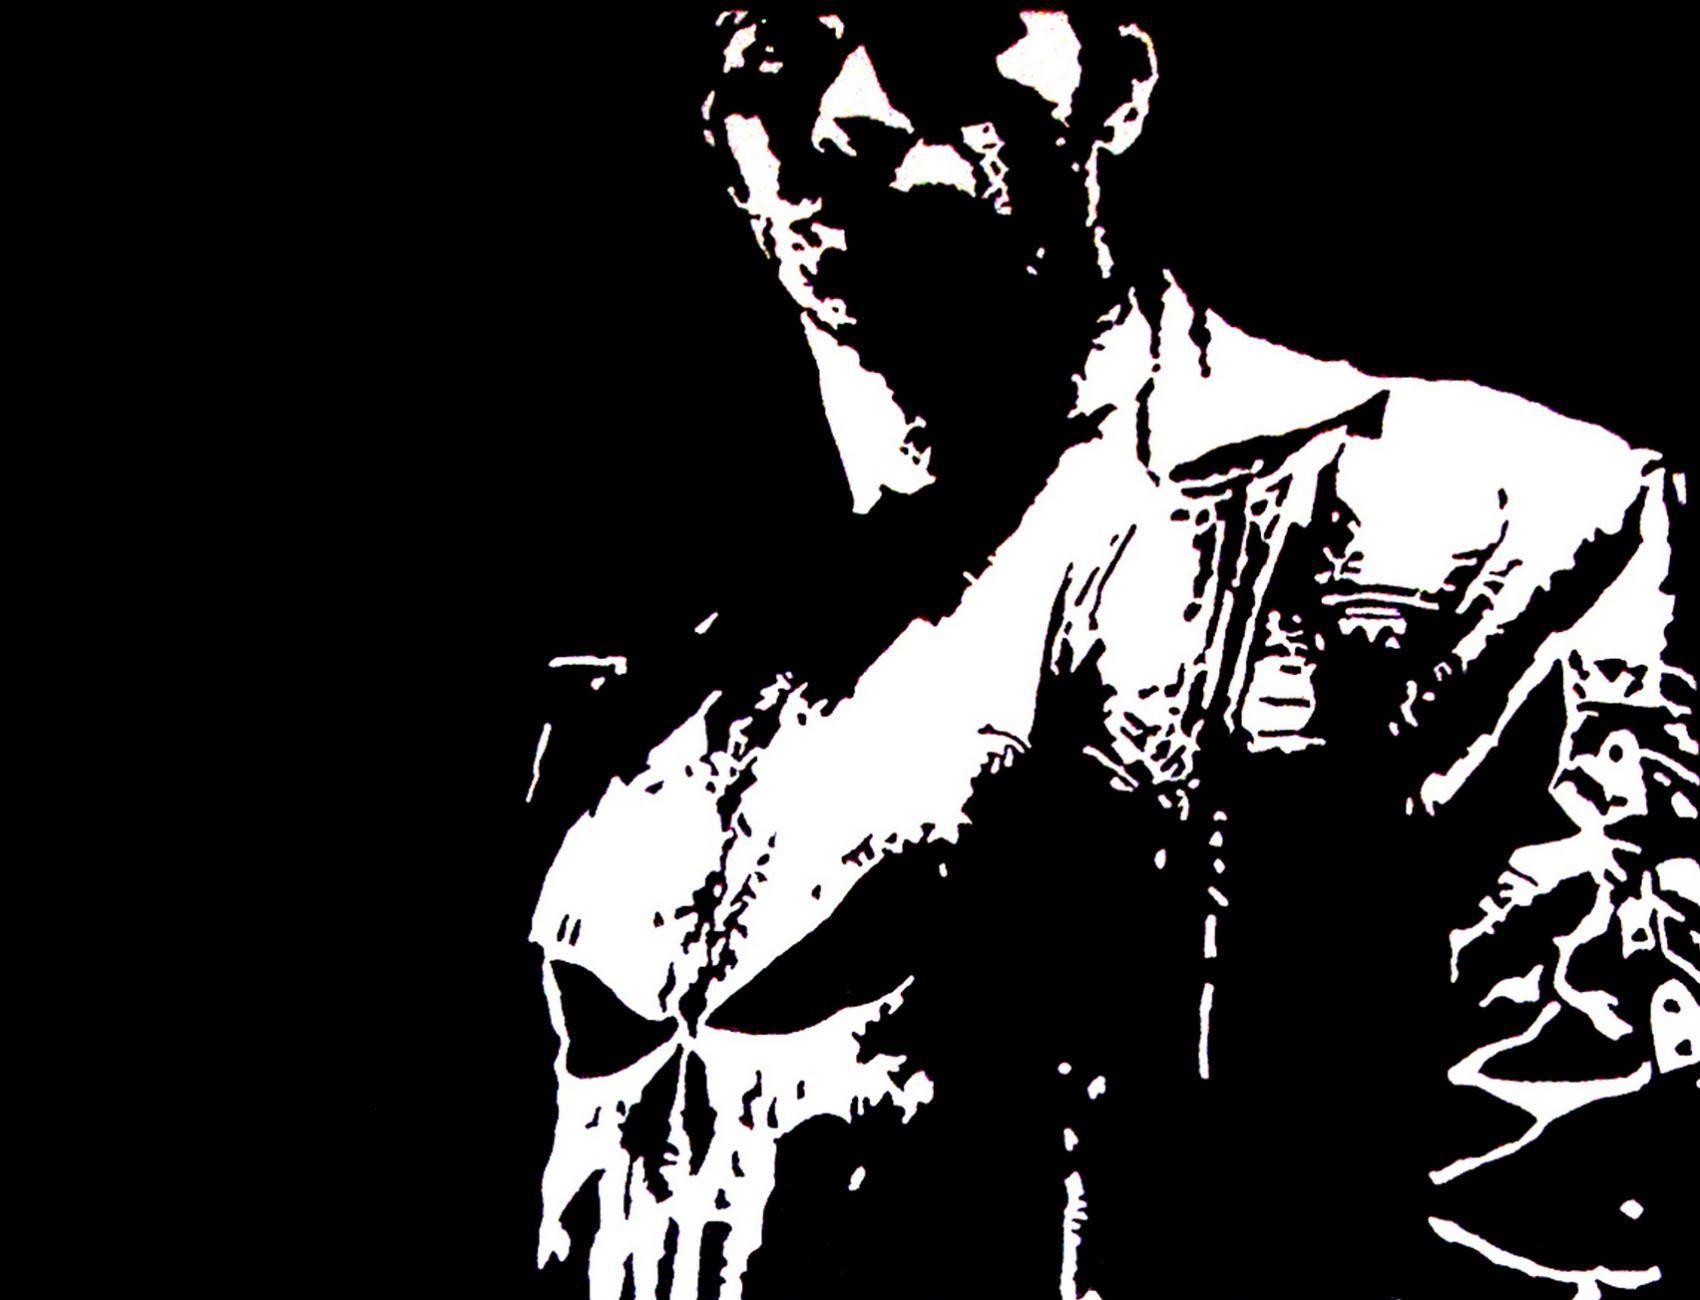 Amazing Wallpaper Marvel Punisher - gzNbV2f  Image_4857.jpg